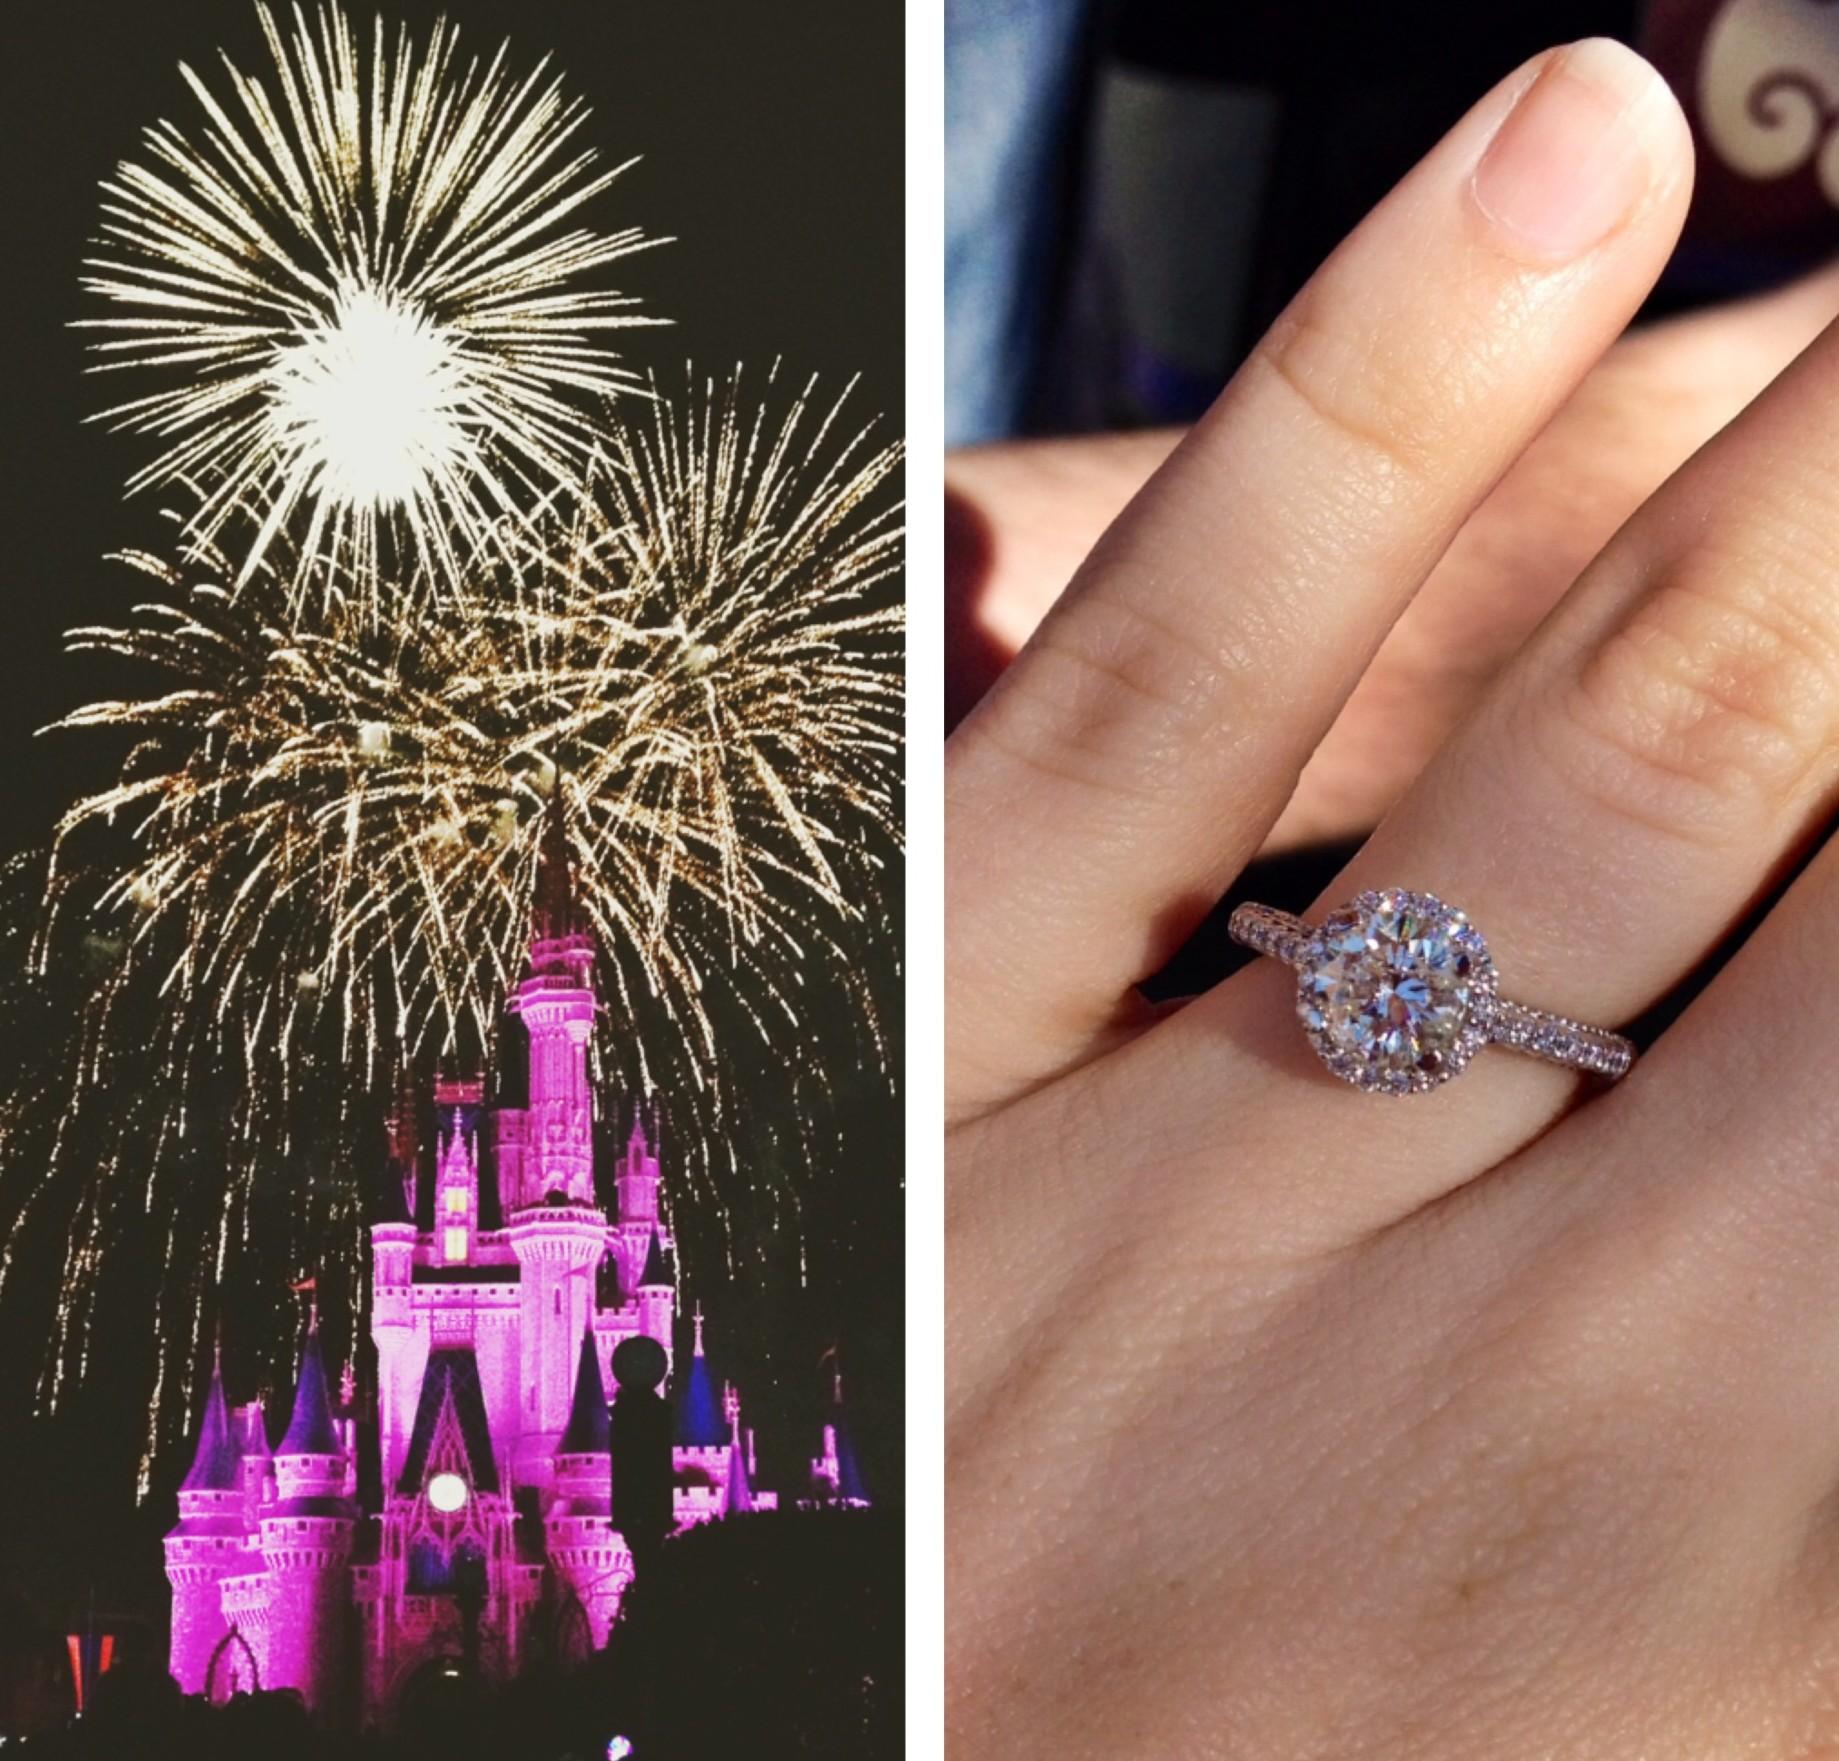 Image 3 of Mallory and Davis Proposal at Disney